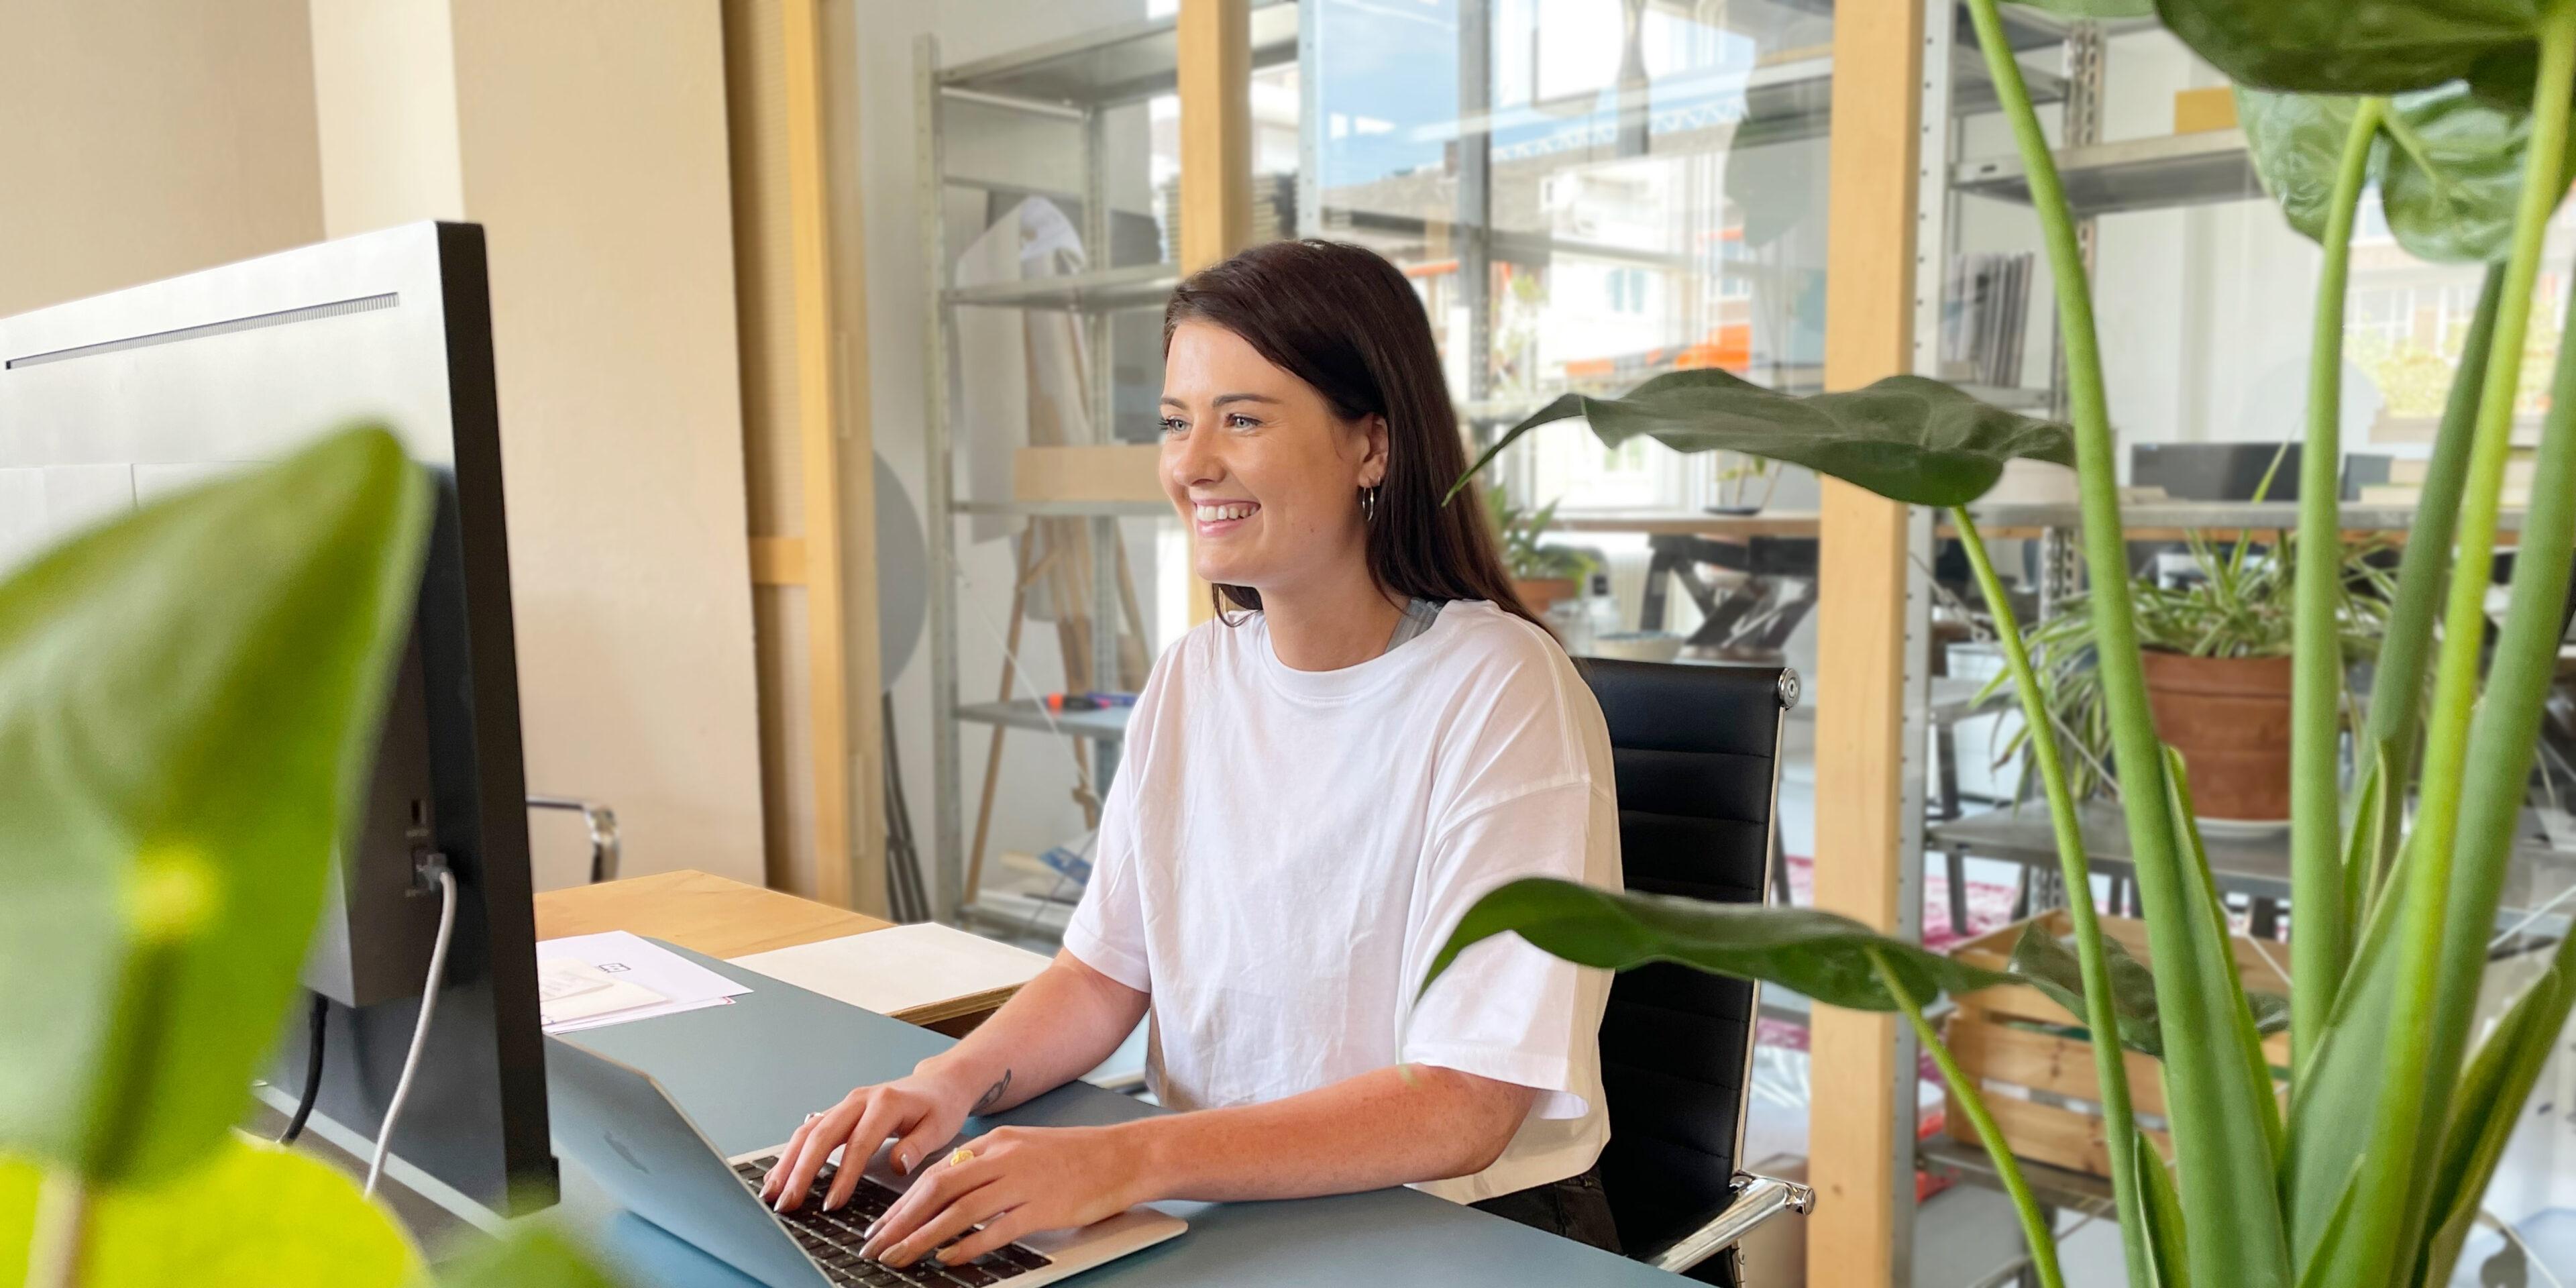 Wild-Digital-Meet-the-Team-Emma-Northridge-Front-End-Developer